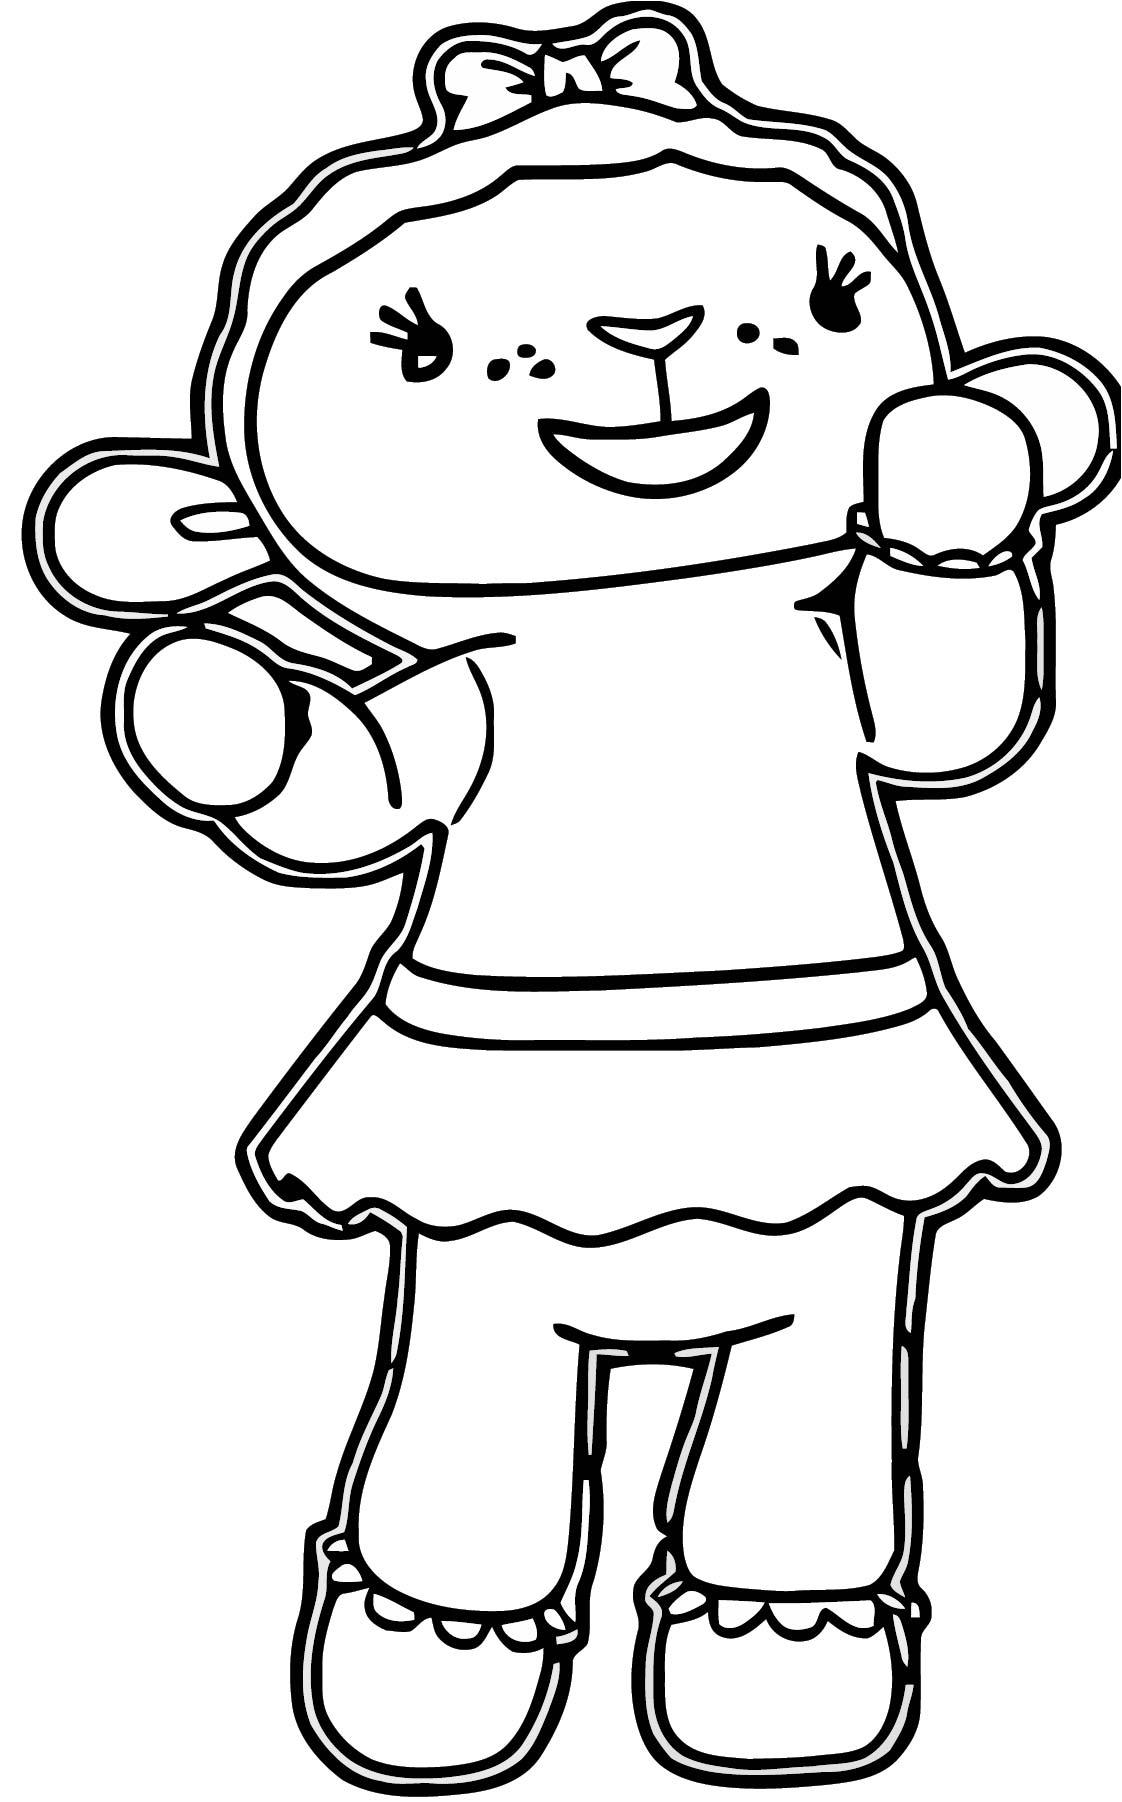 Lambie 5 Coloring Page Wecoloringpage Com